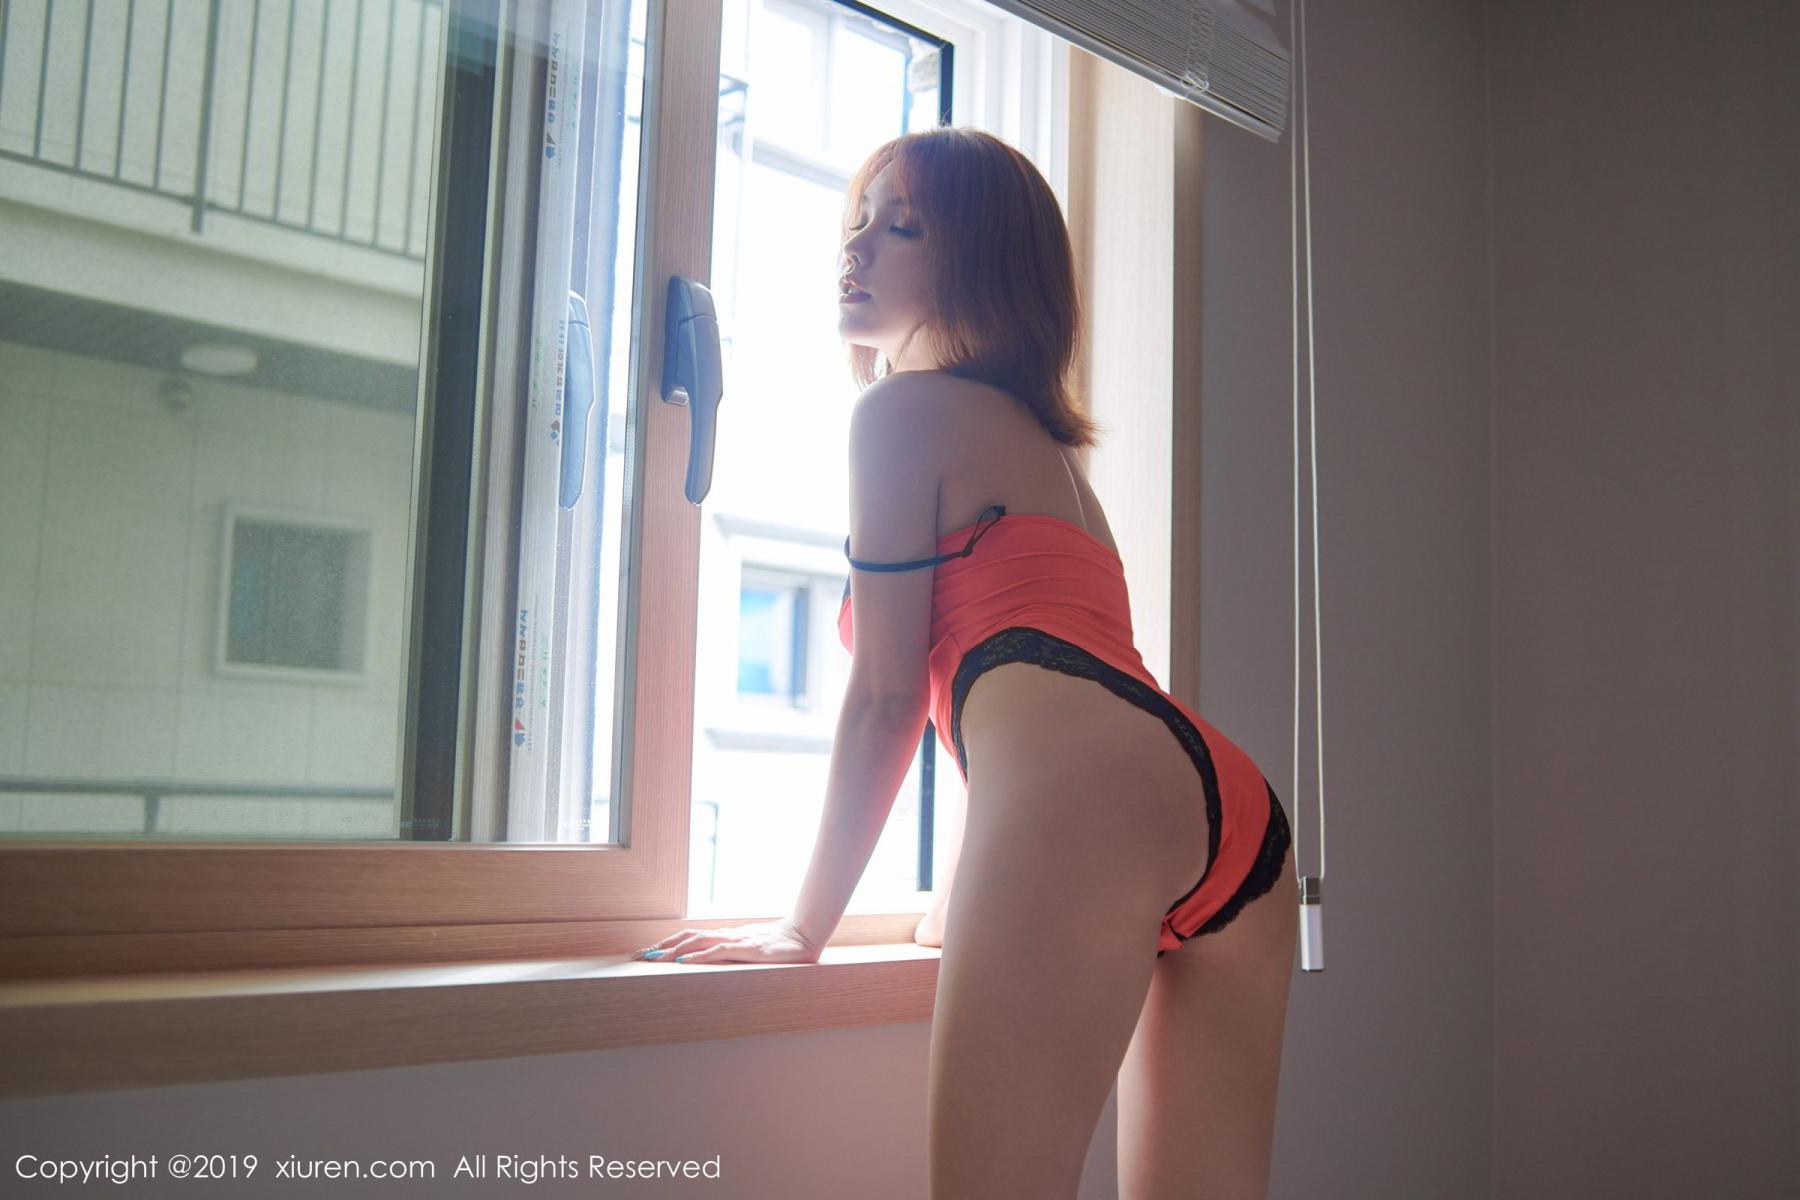 [XiuRen] Vol.1684 Huang Le Ran 44P, Huang Le Ran, Underwear, Xiuren